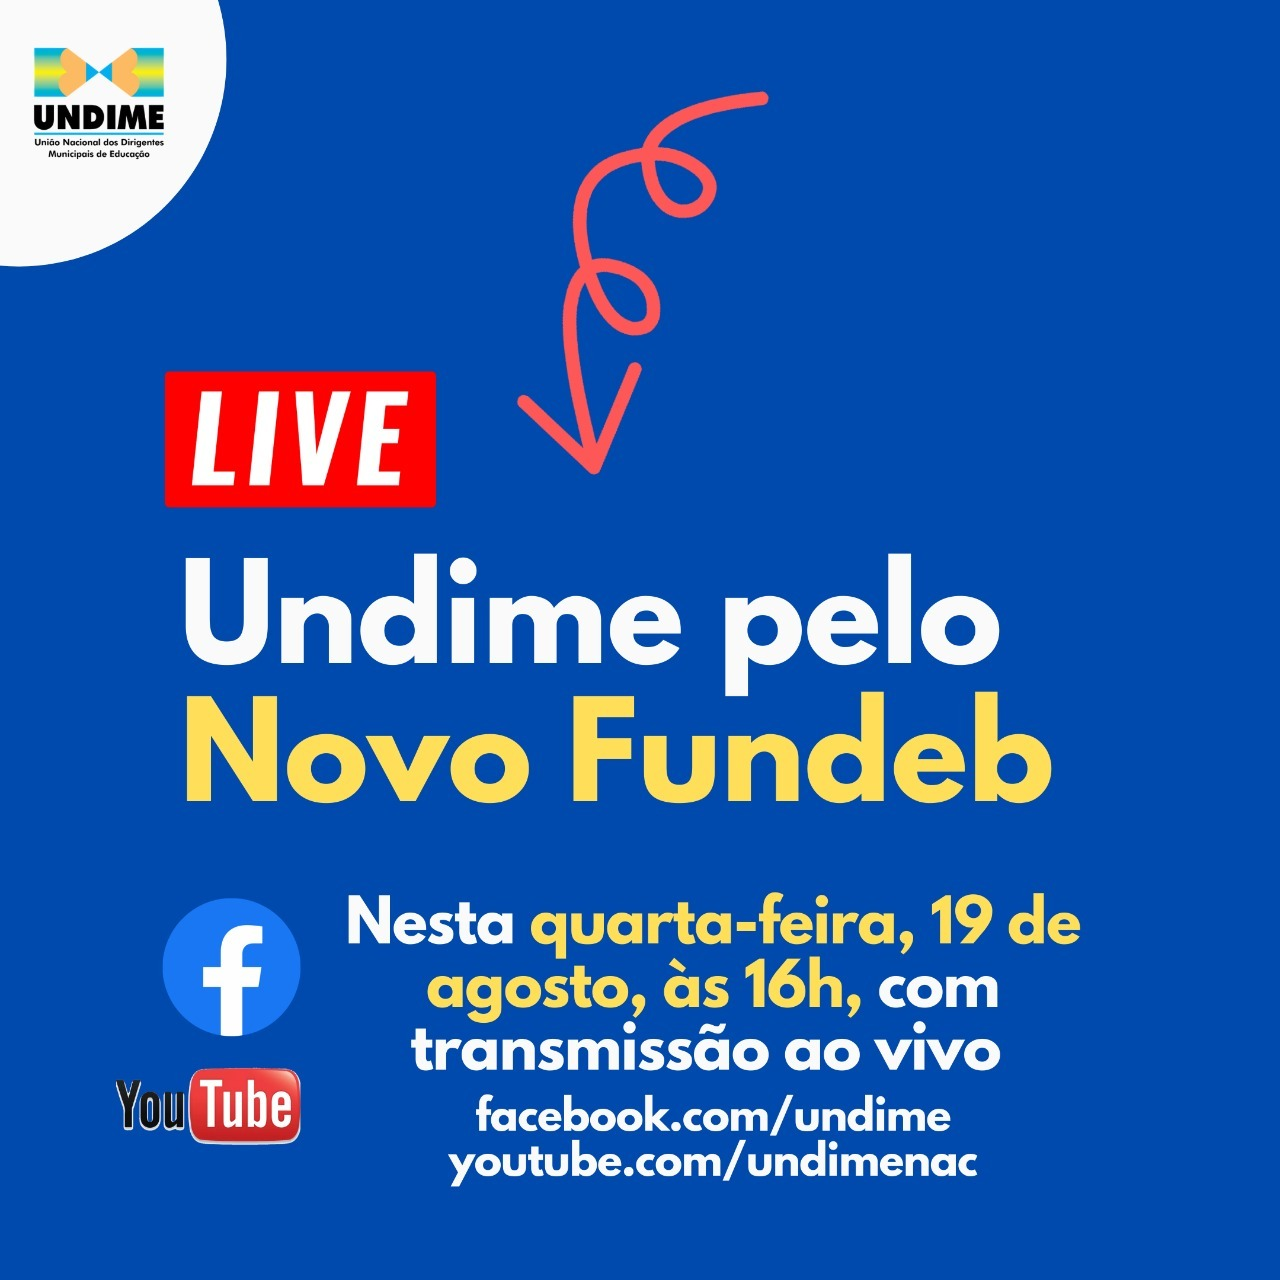 Undime promove live em defesa do Novo Fundeb